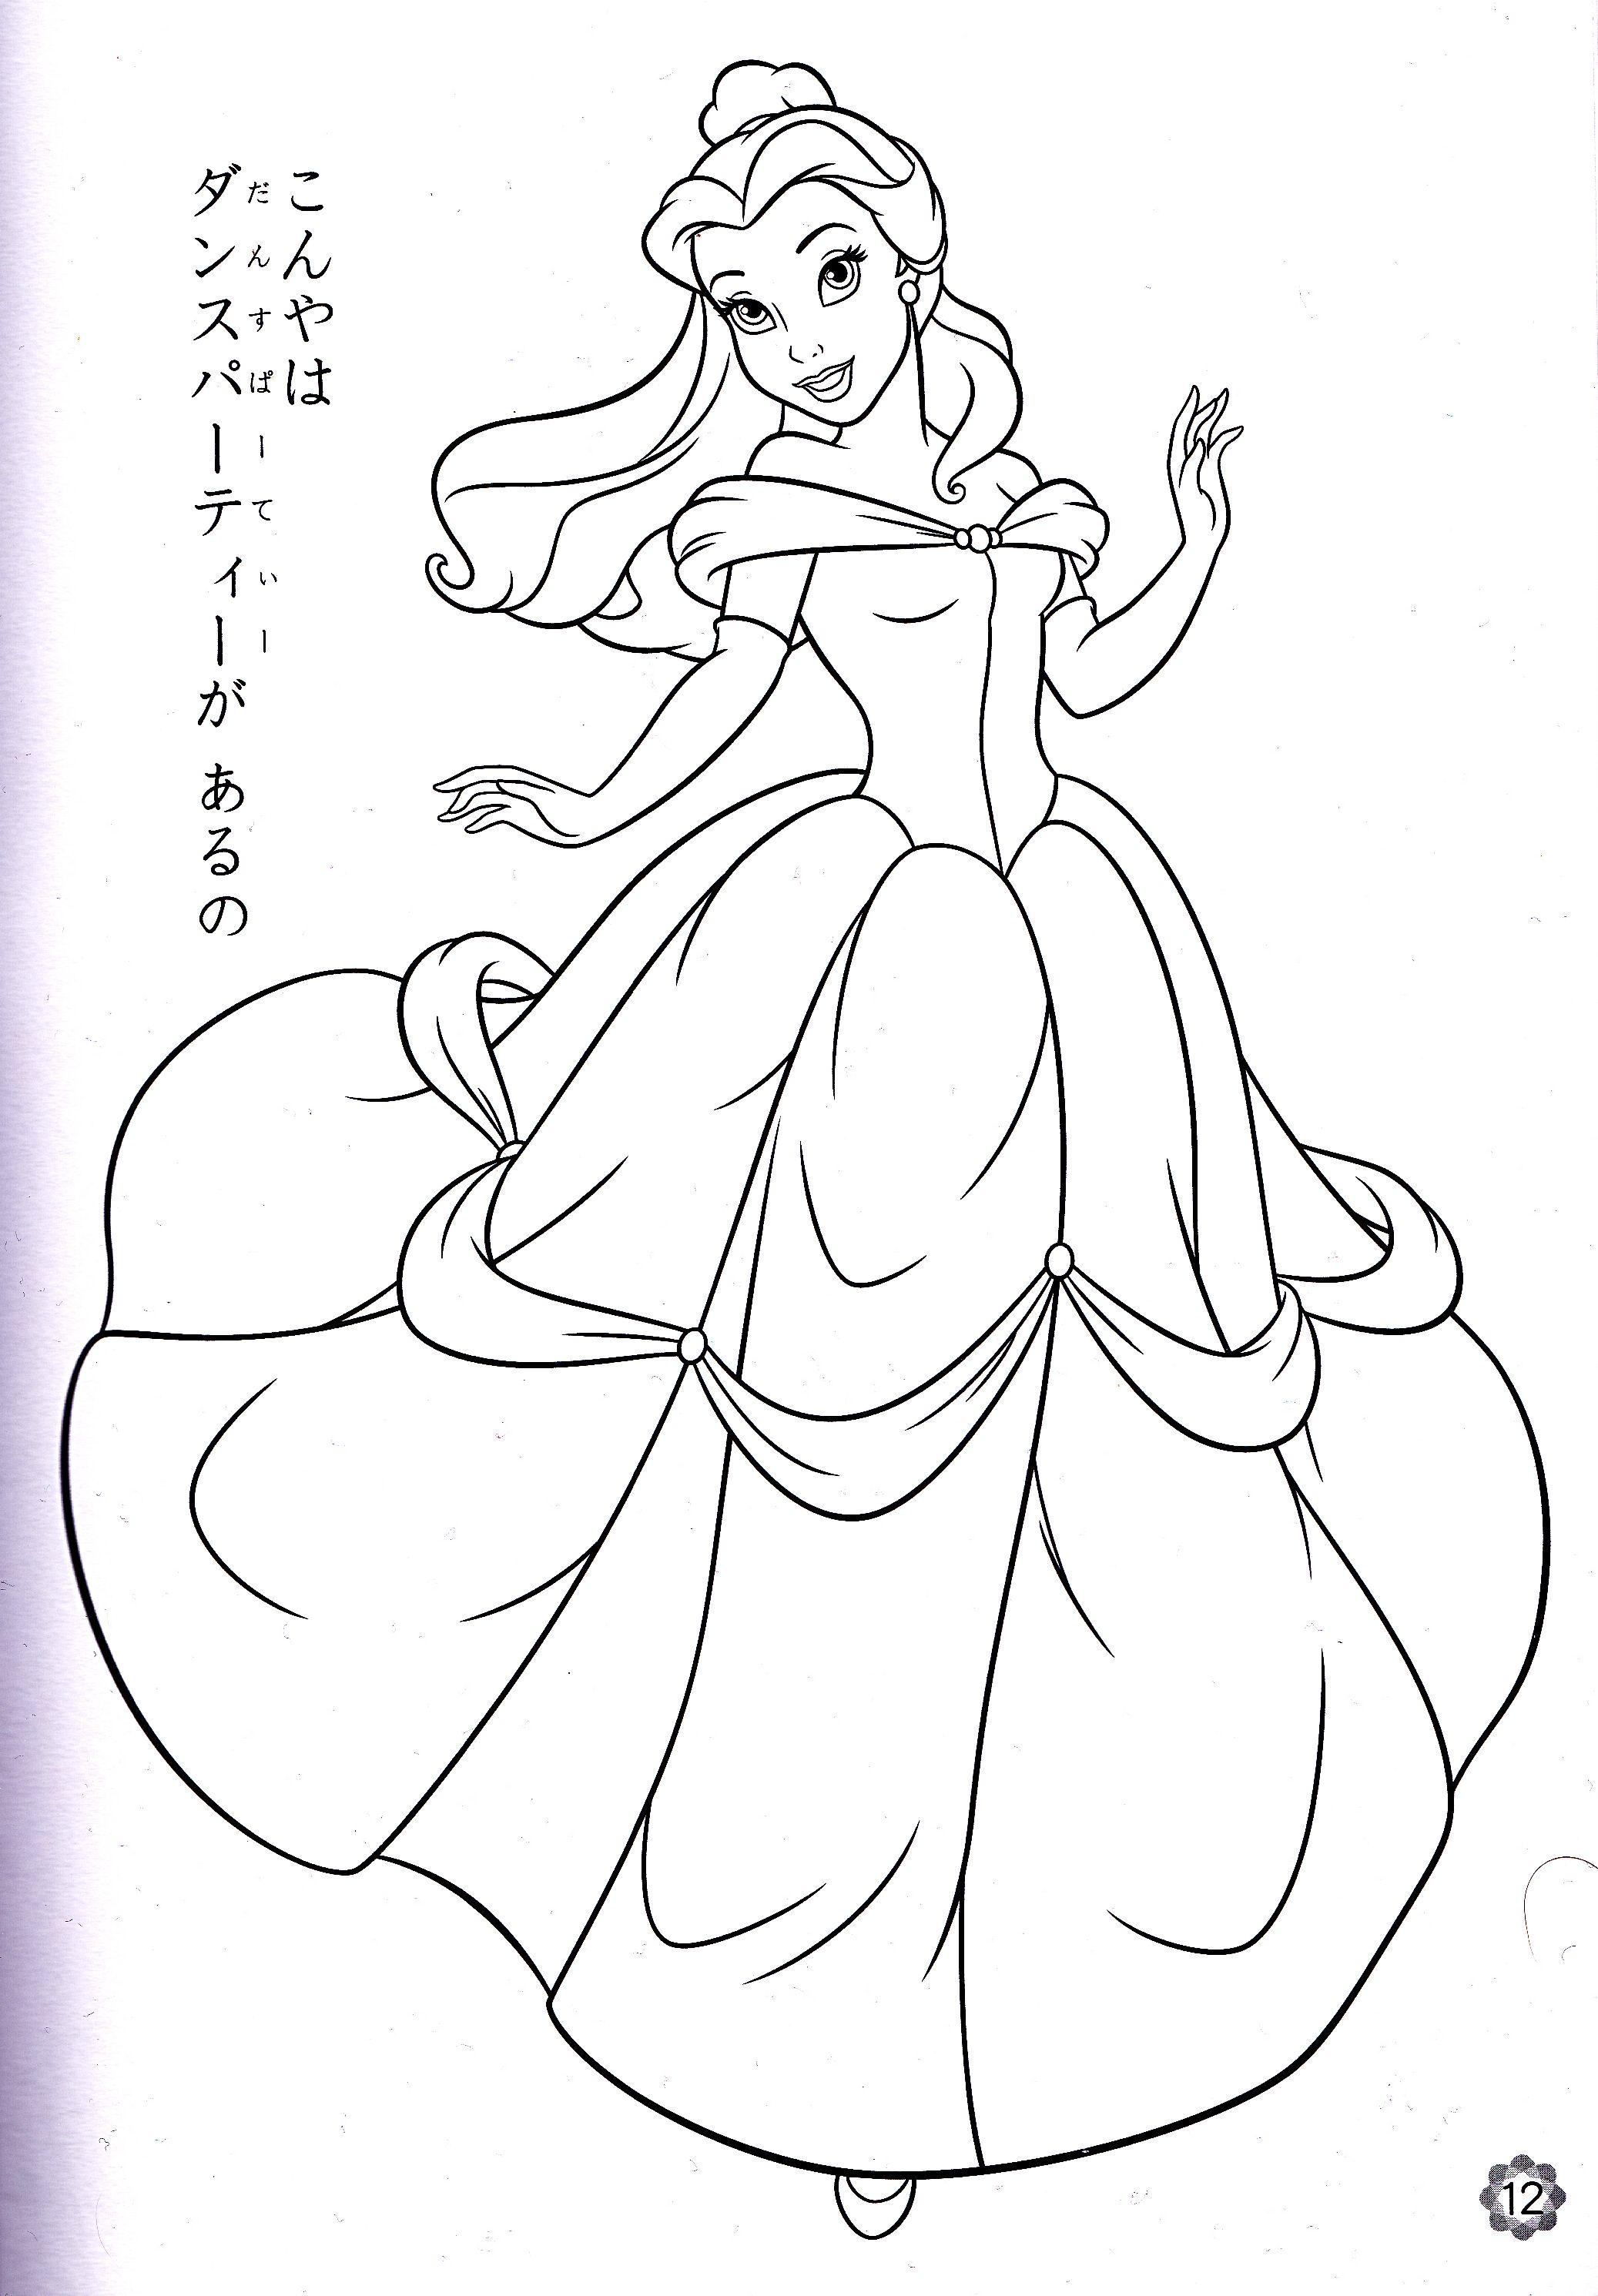 Walt Disney Characters Photo Walt Disney Coloring Pages Princess Belle Disney Princess Coloring Pages Princess Coloring Pages Belle Coloring Pages